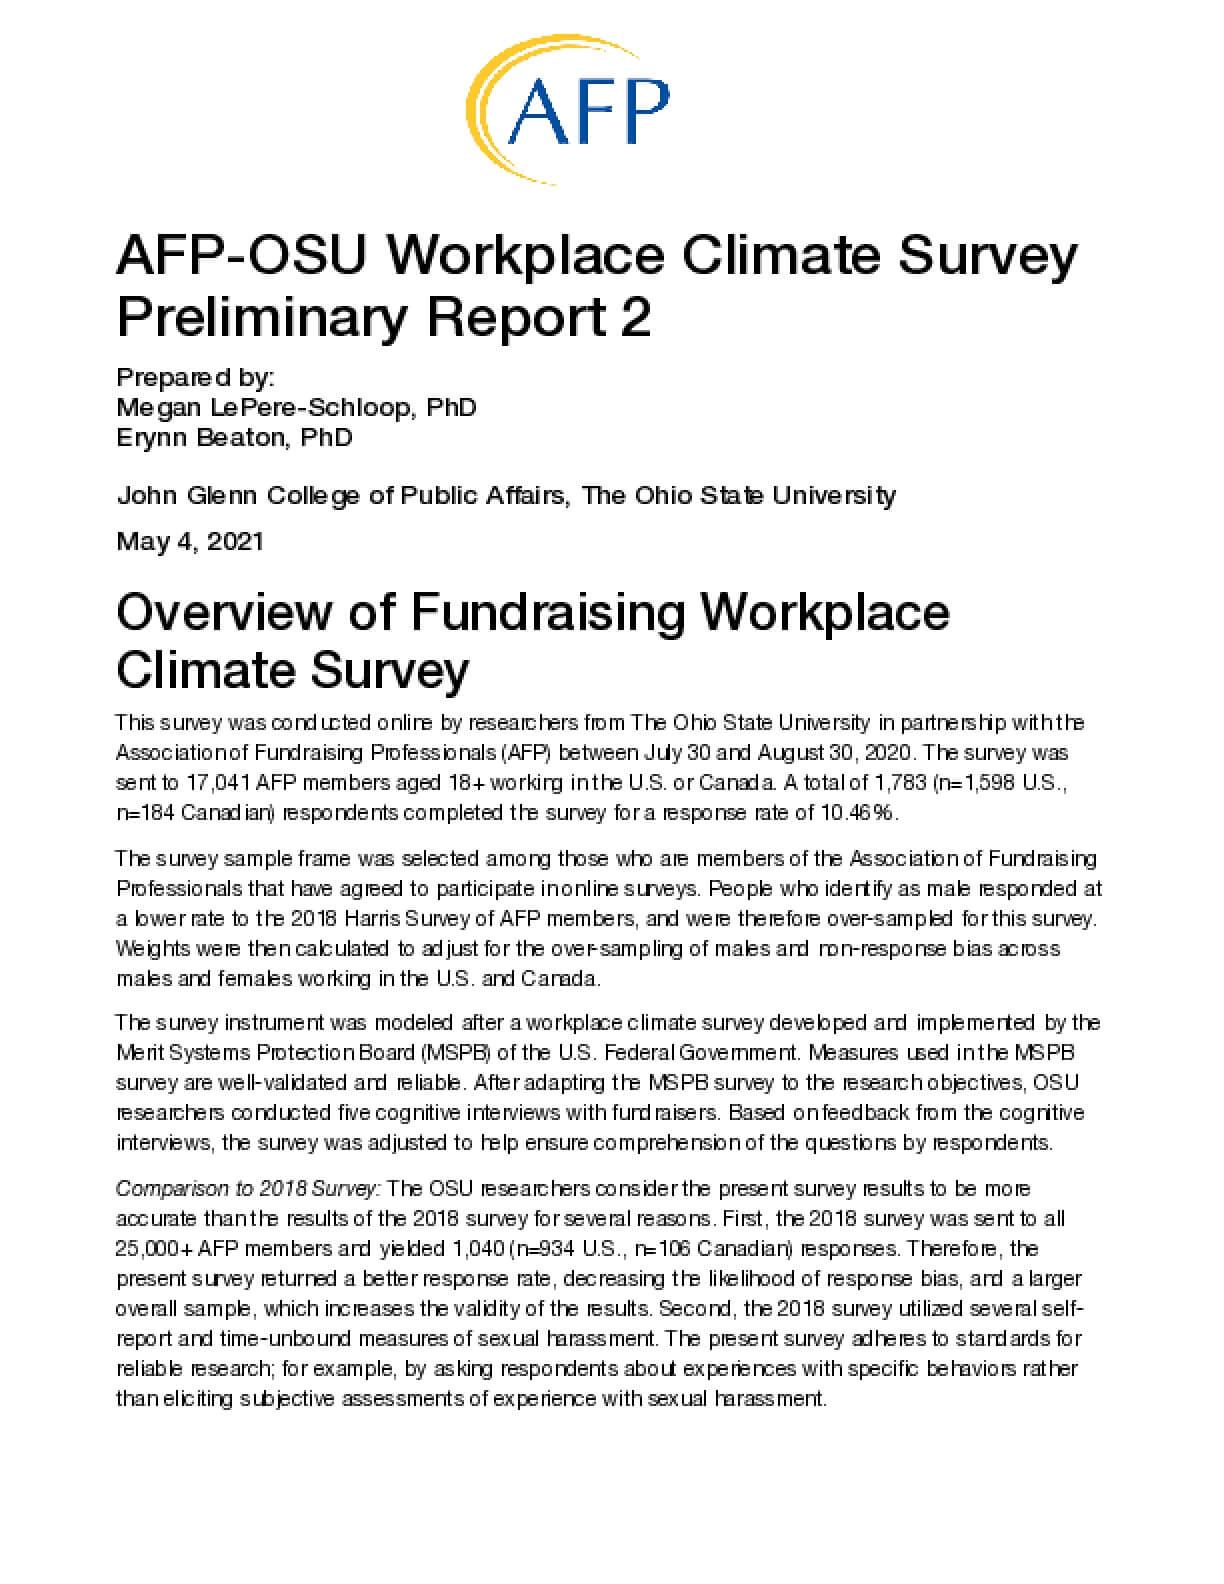 AFP-OSU Workplace Climate Survey Preliminary Report 2